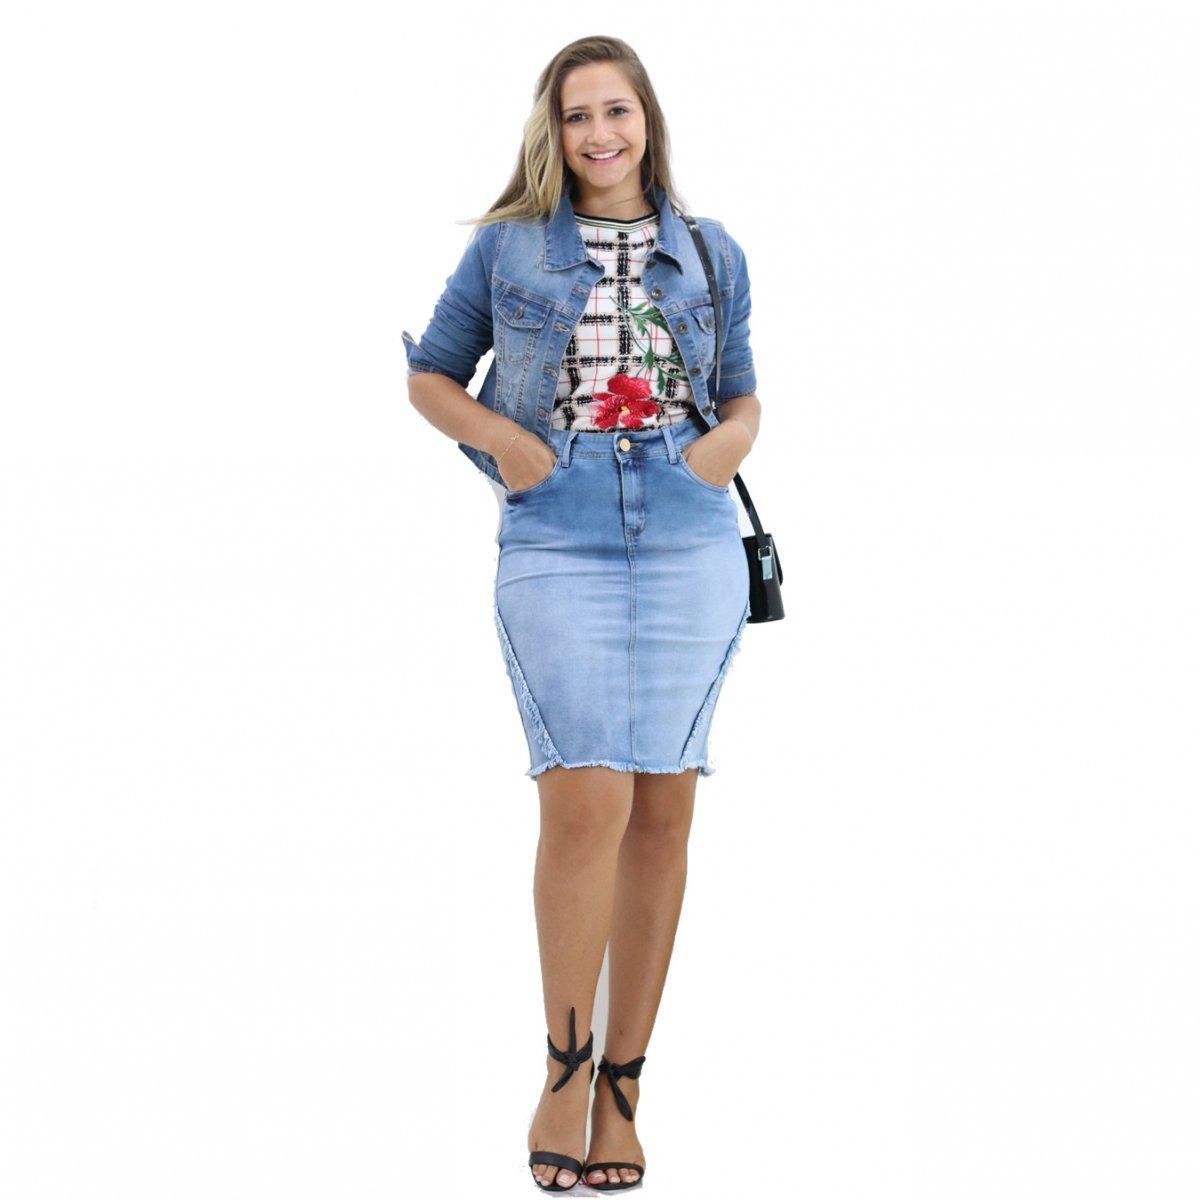 56f35cab59 Saia Jeans Secretaria Barra Desfiada Jeans - MM Concept